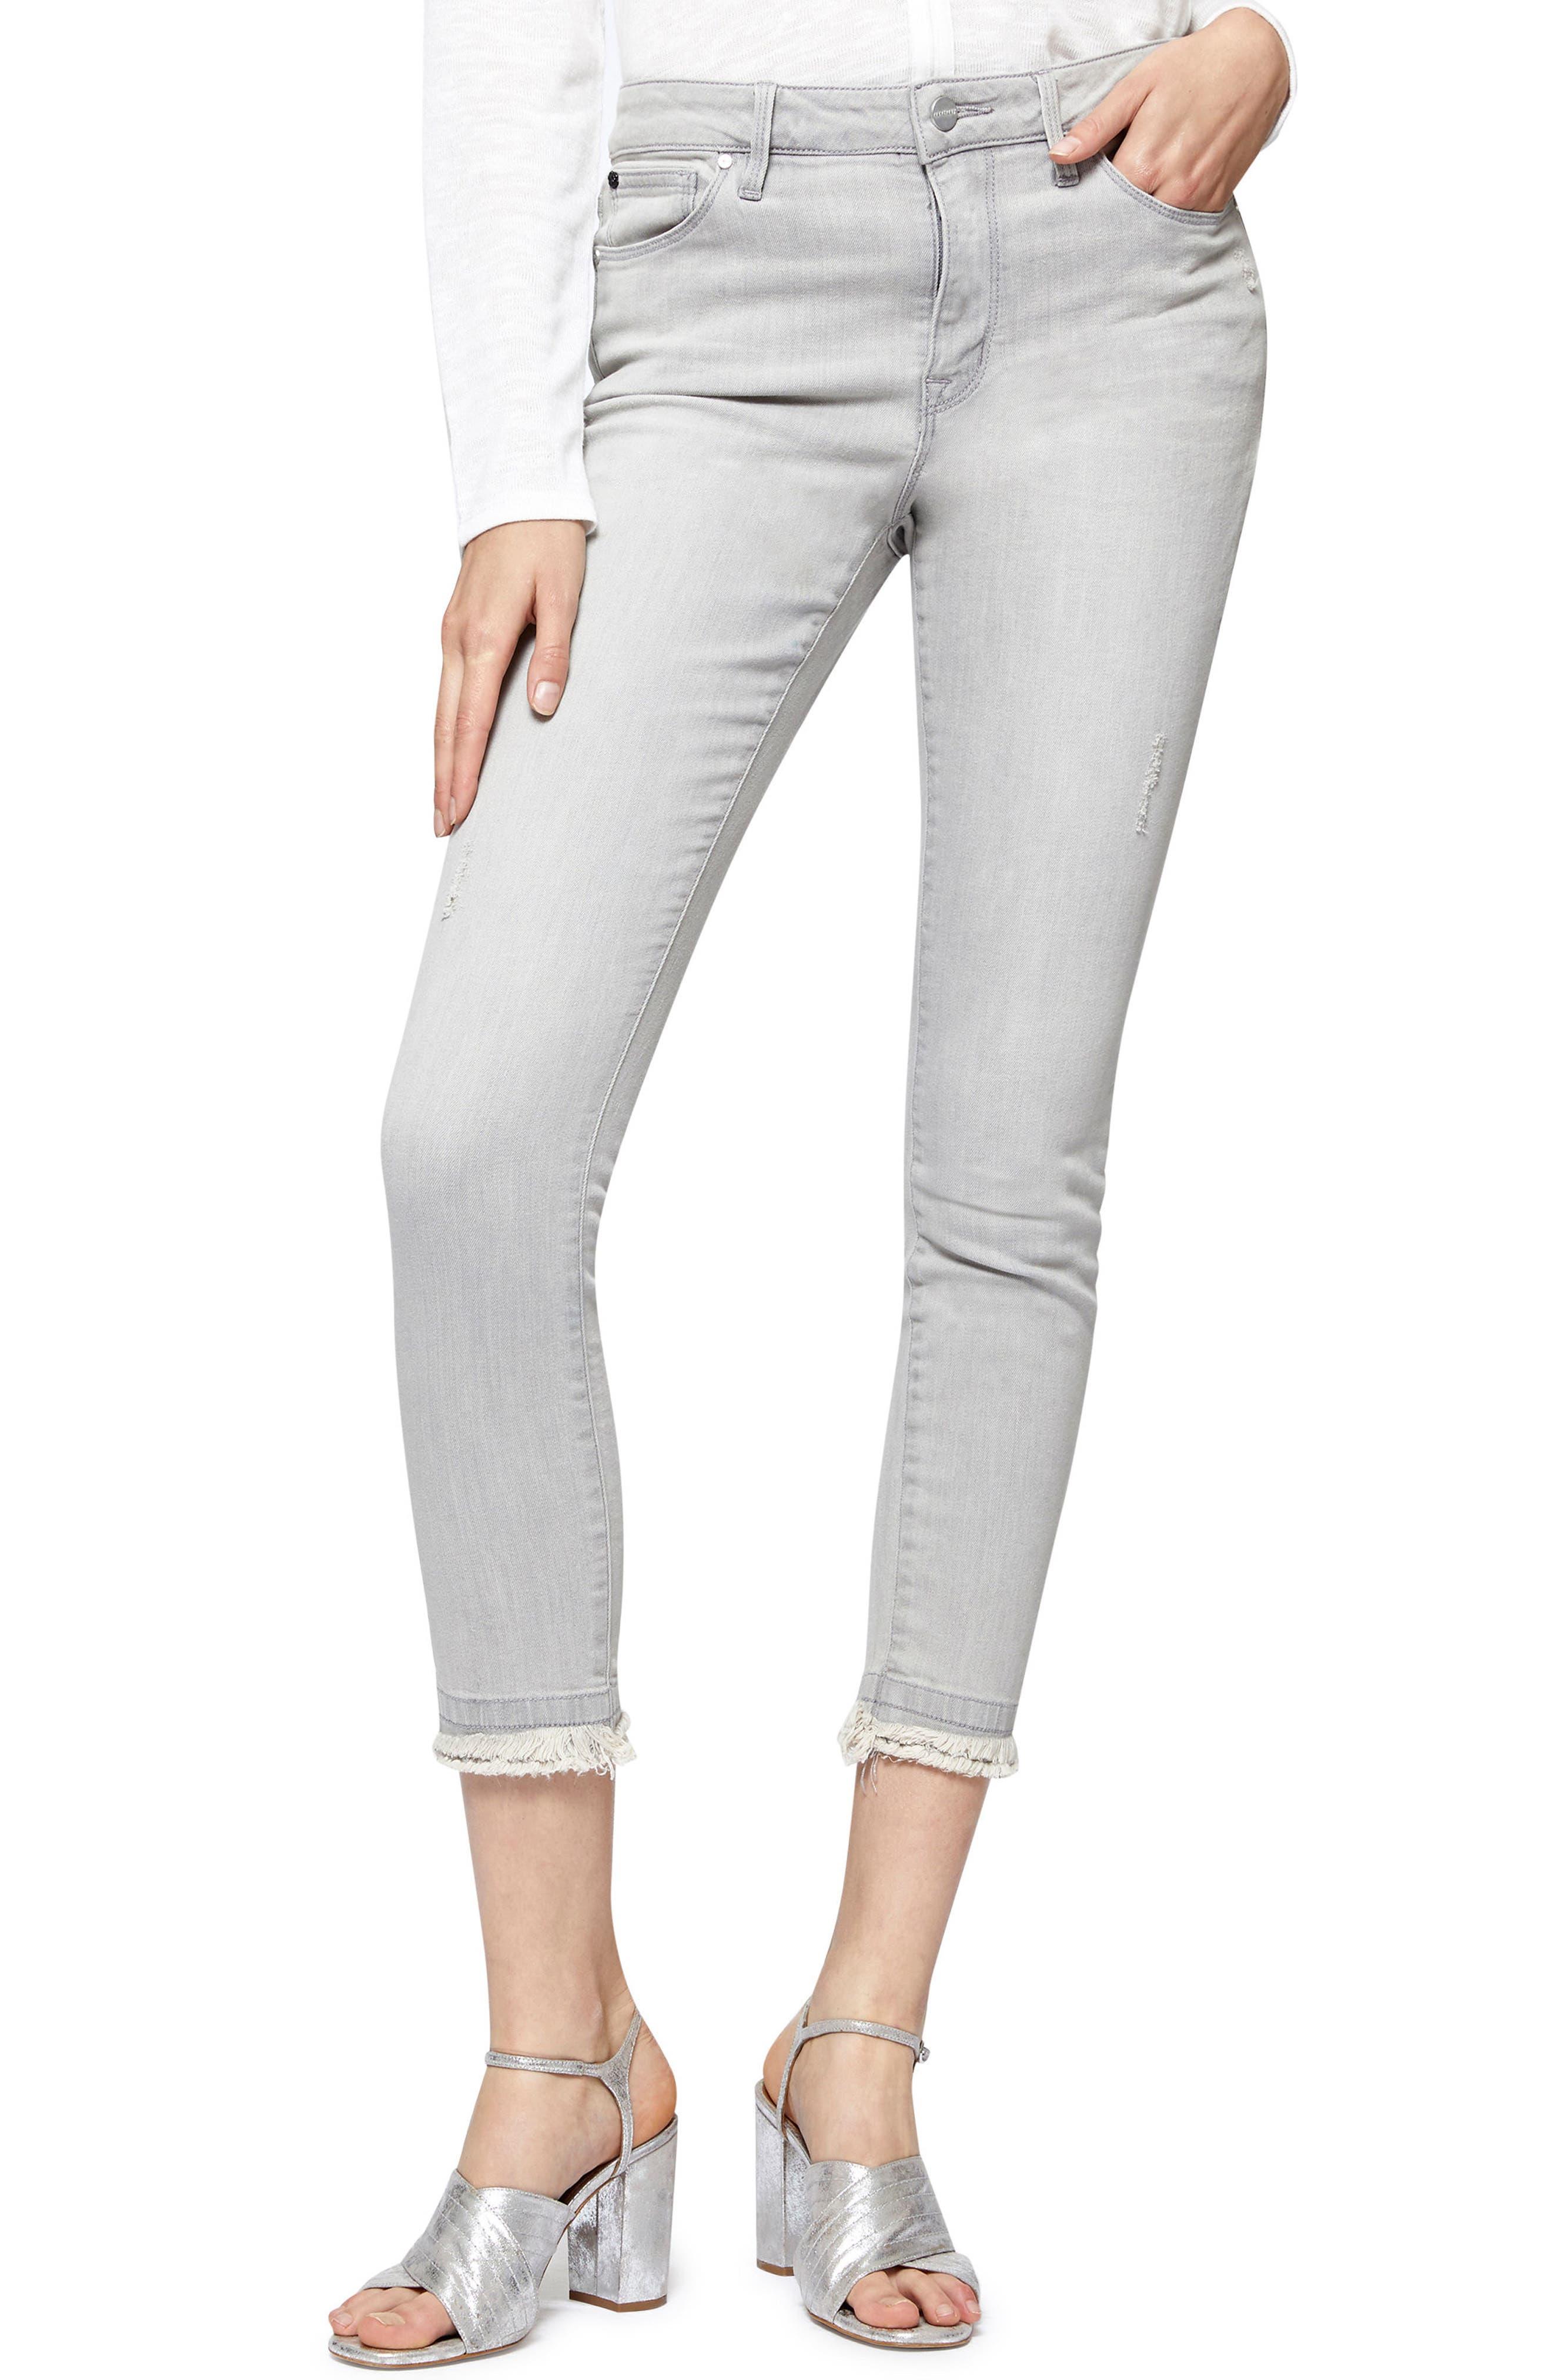 Saige Double Fray Ankle Jeans,                             Main thumbnail 1, color,                             Greyson